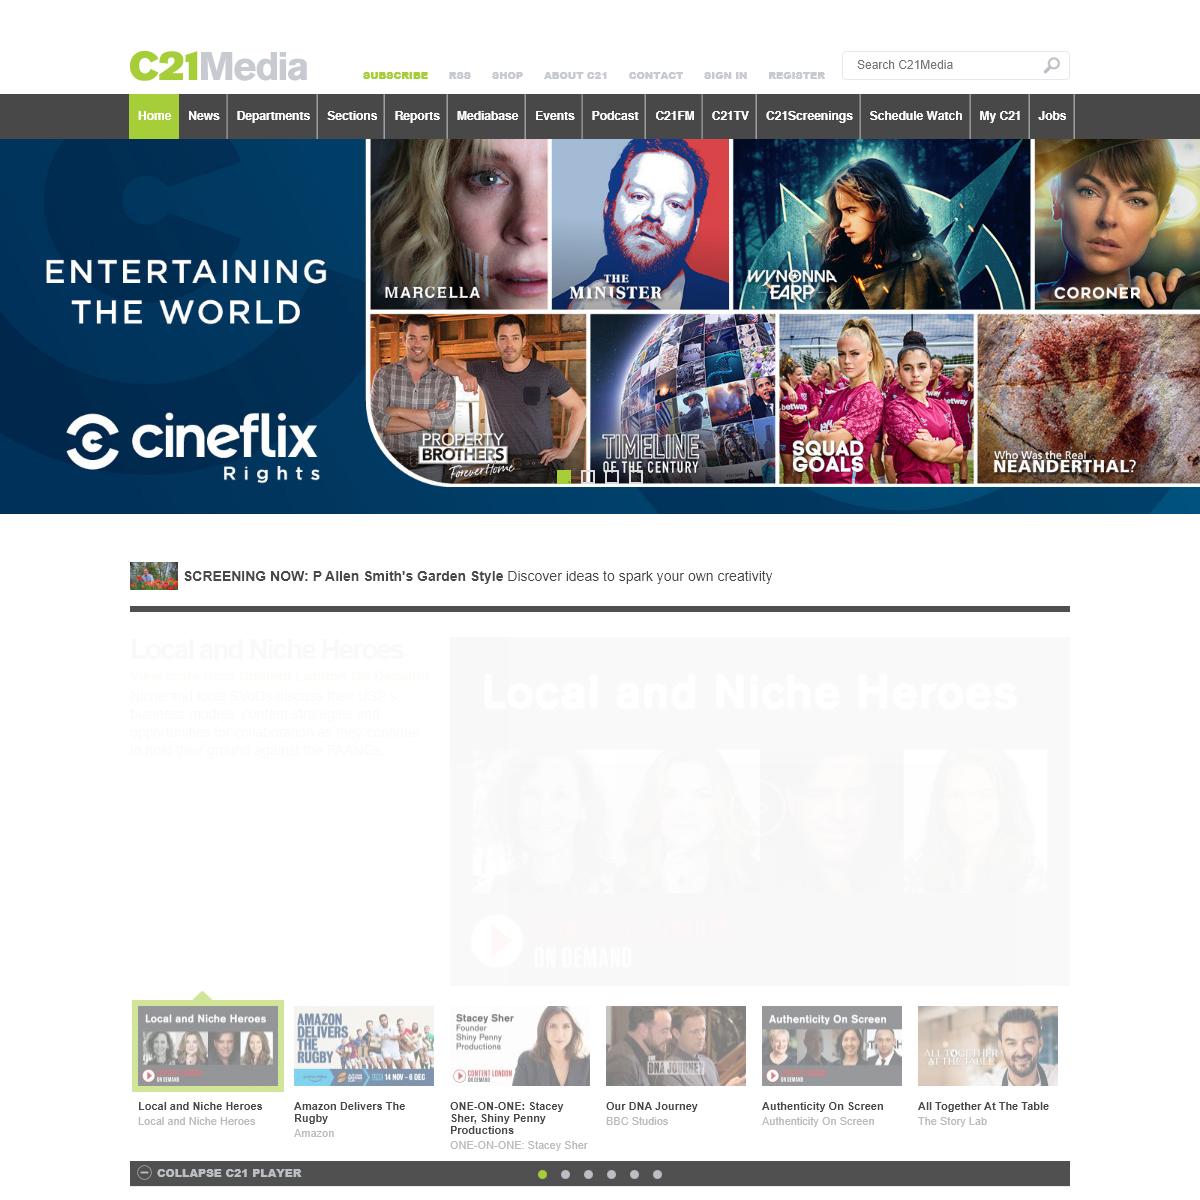 C21Media - Home to the International Entertainment Community